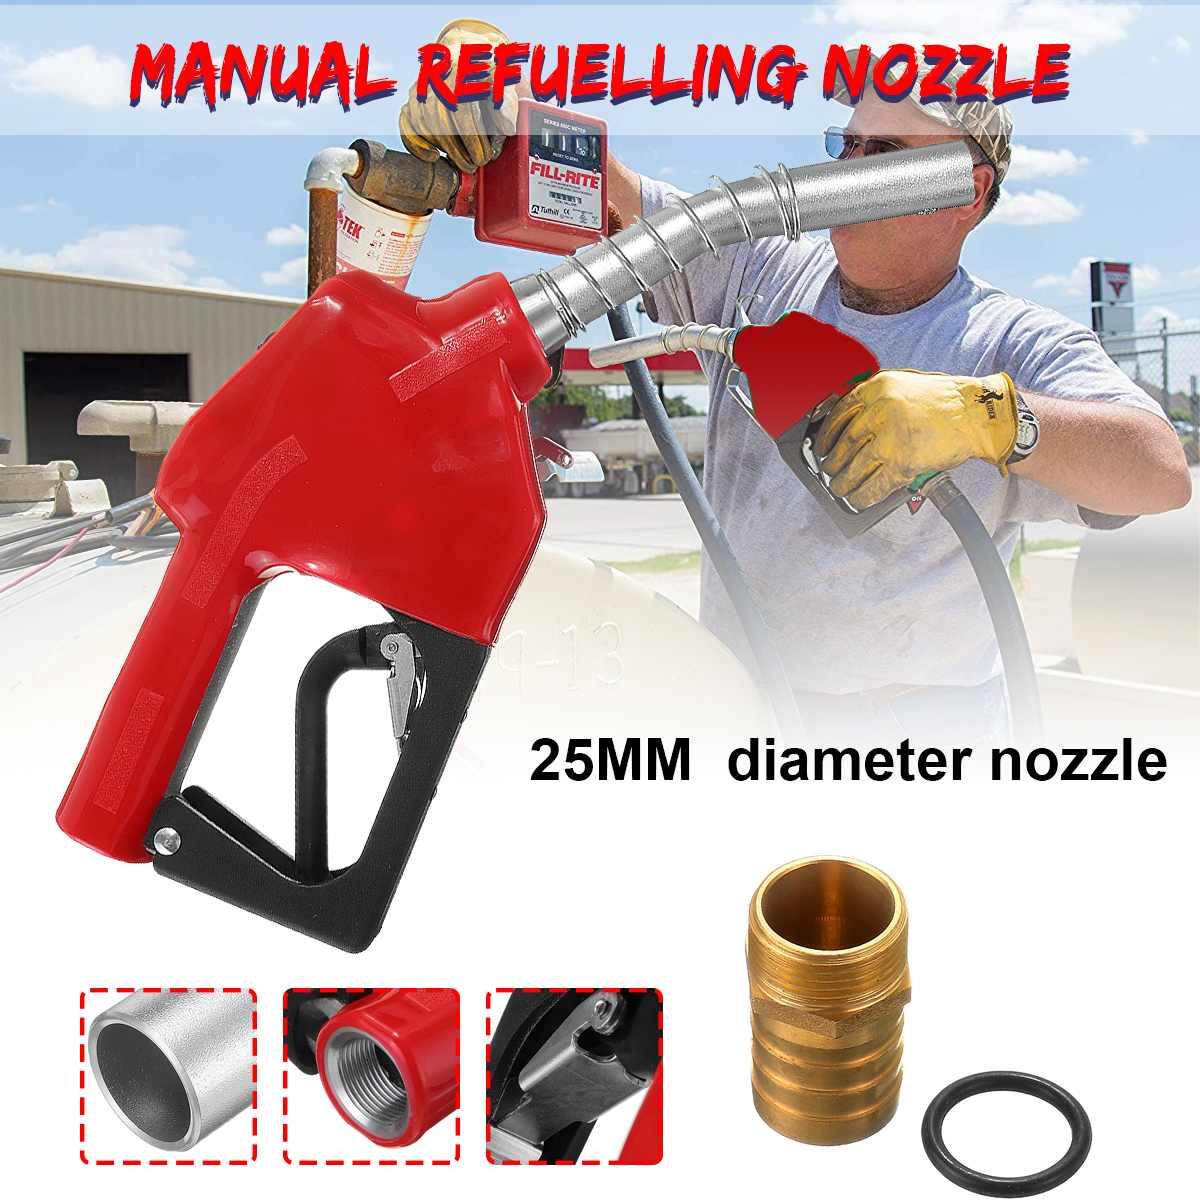 Car Fuel Filling Nozzle-Gun Automatically Cuts Off The Diesel-Fuel-Gun For Diesel, Kerosene, Petrol Below 90# 25mm Nozzle